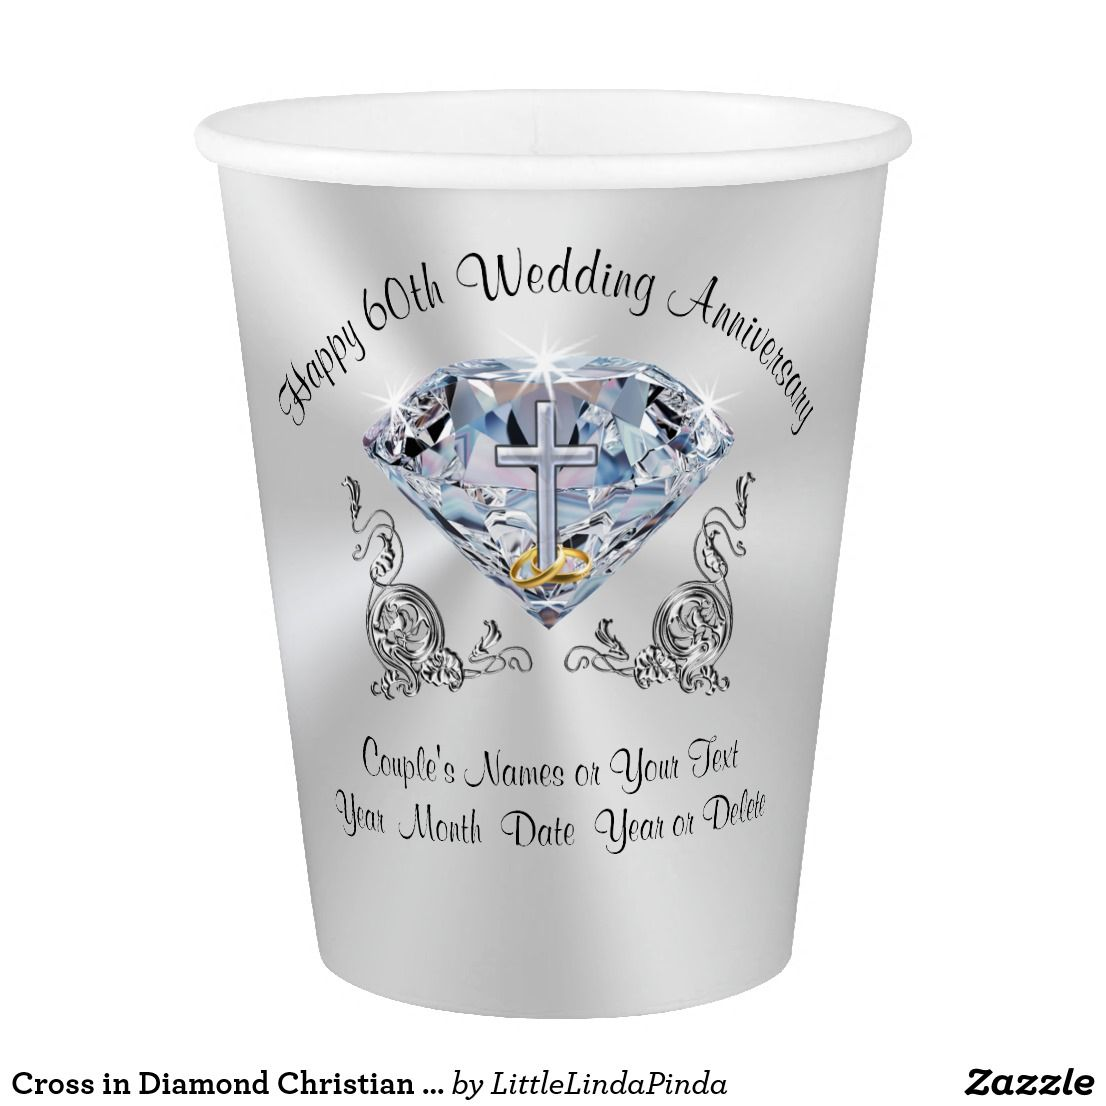 Cross in Diamond Christian Wedding Anniversary Cup